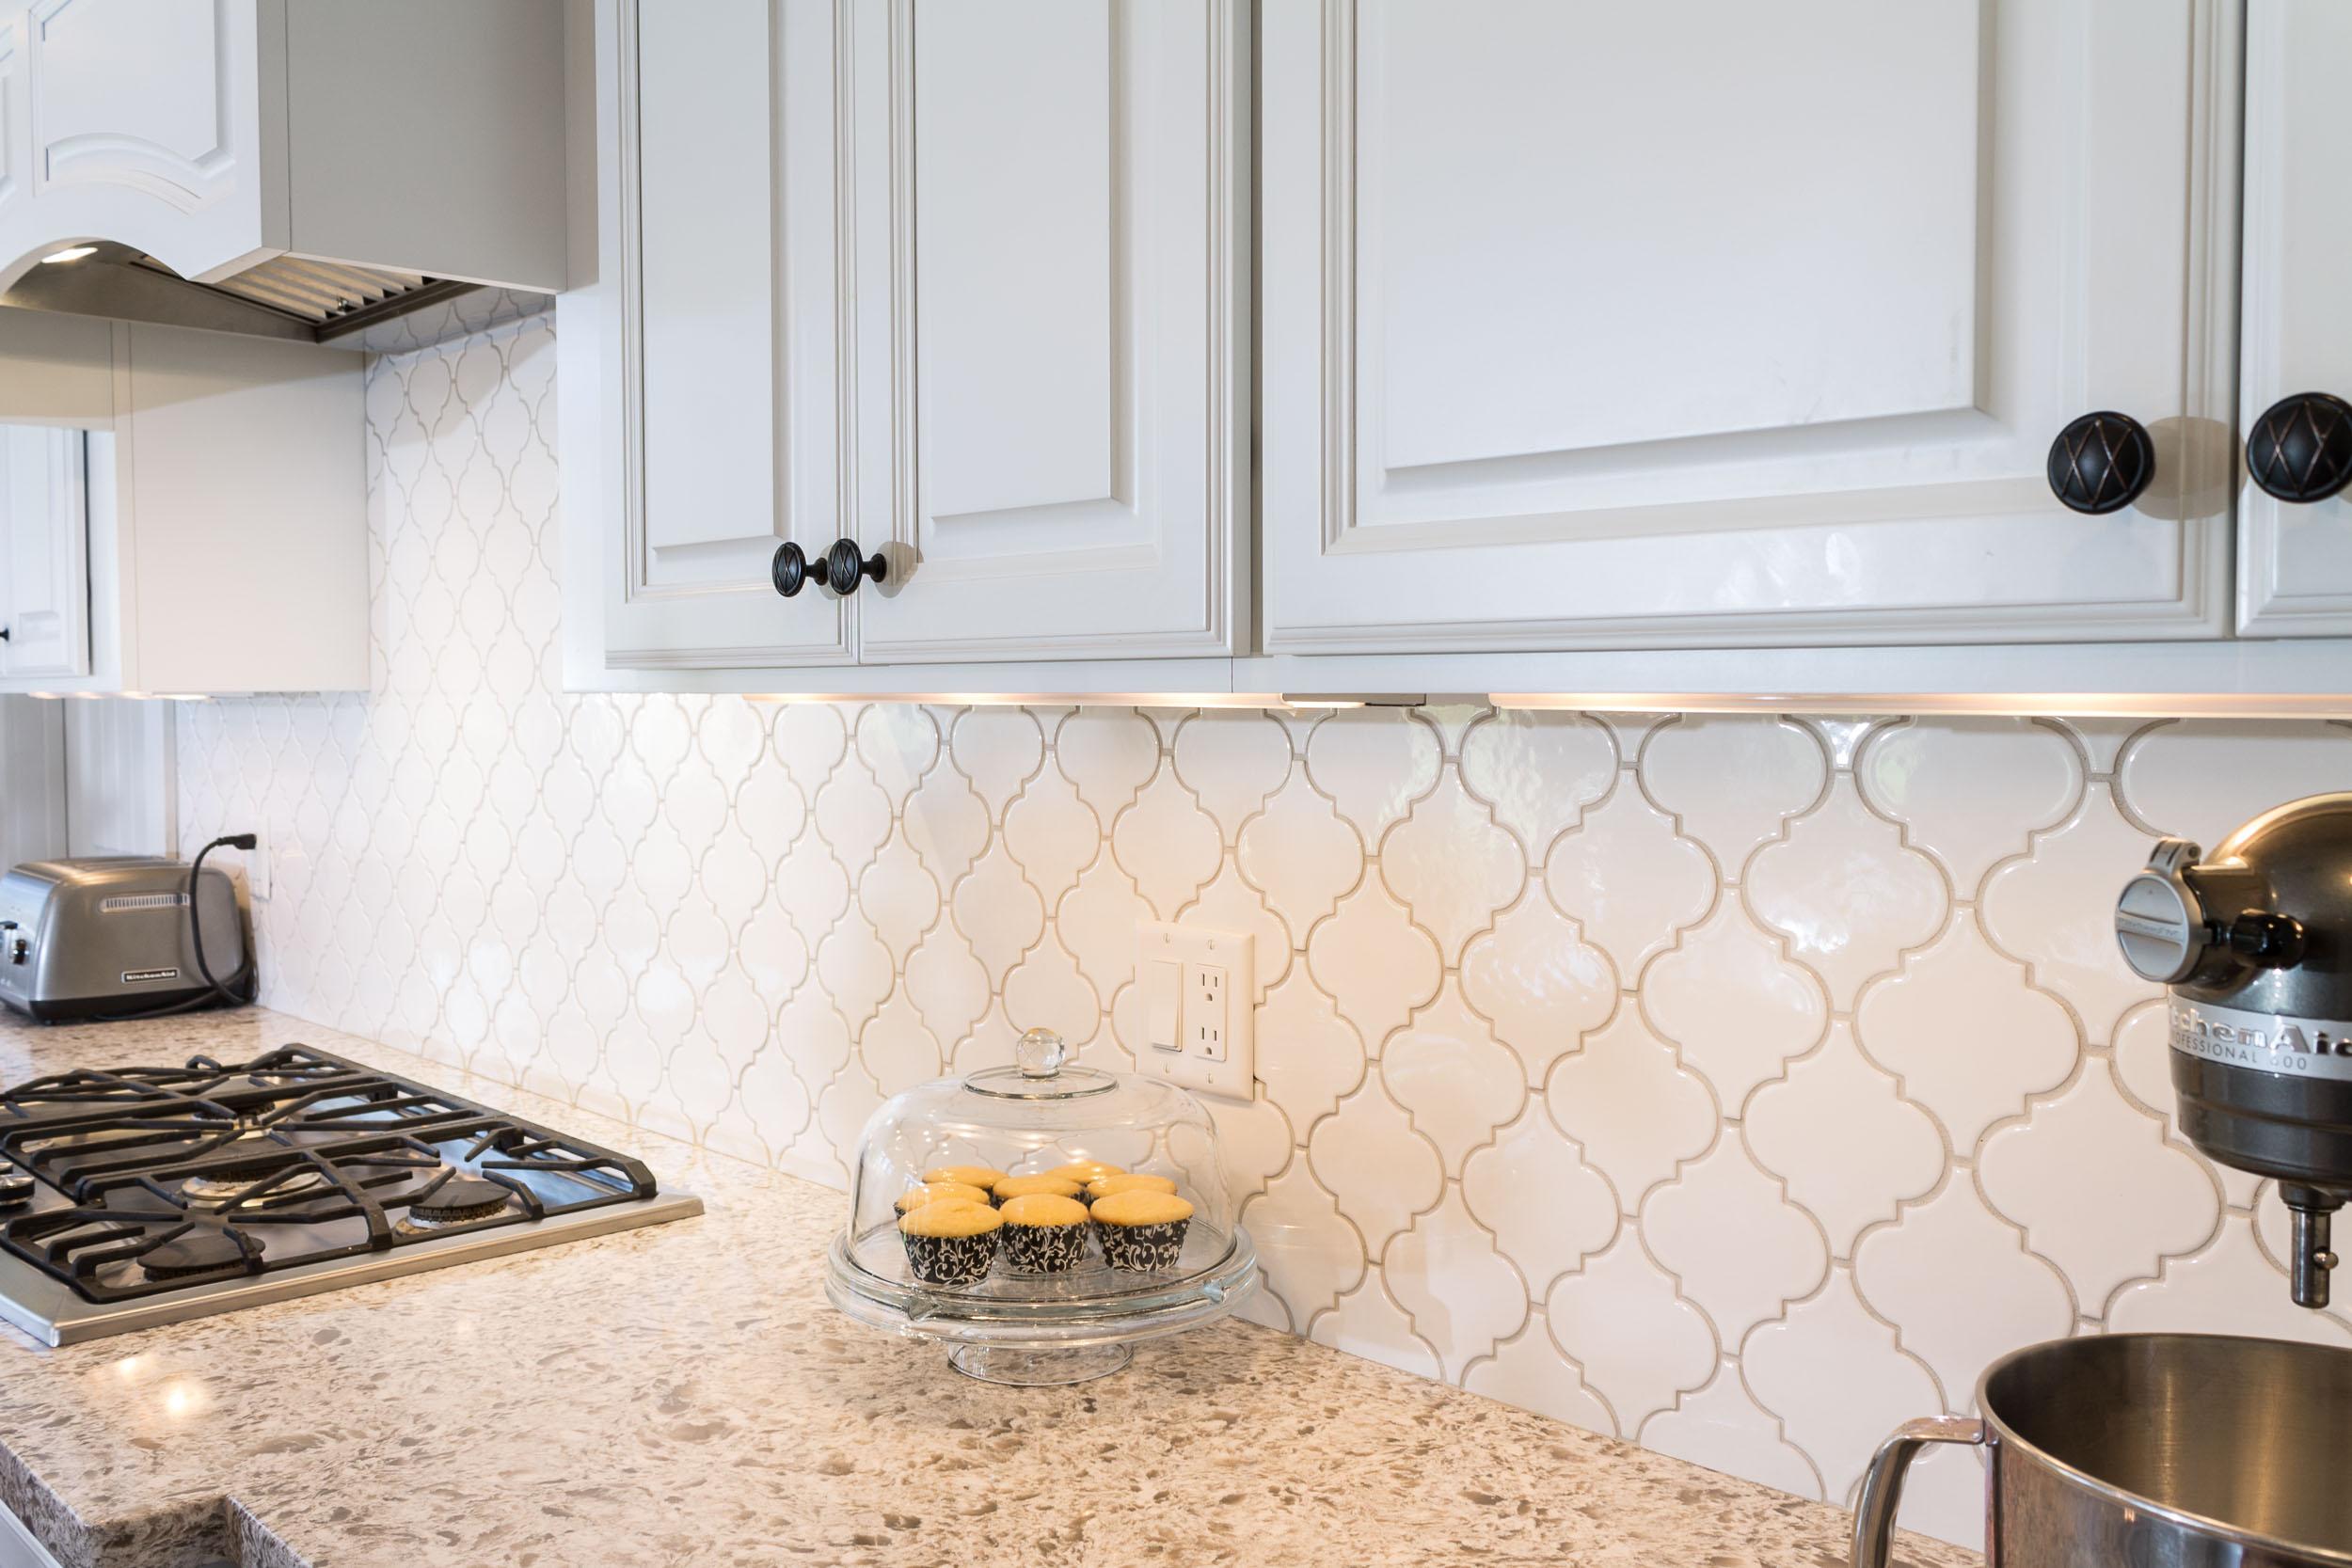 Choosing Grout Color For Kitchen and Bathroom Tile Design — Degnan ...